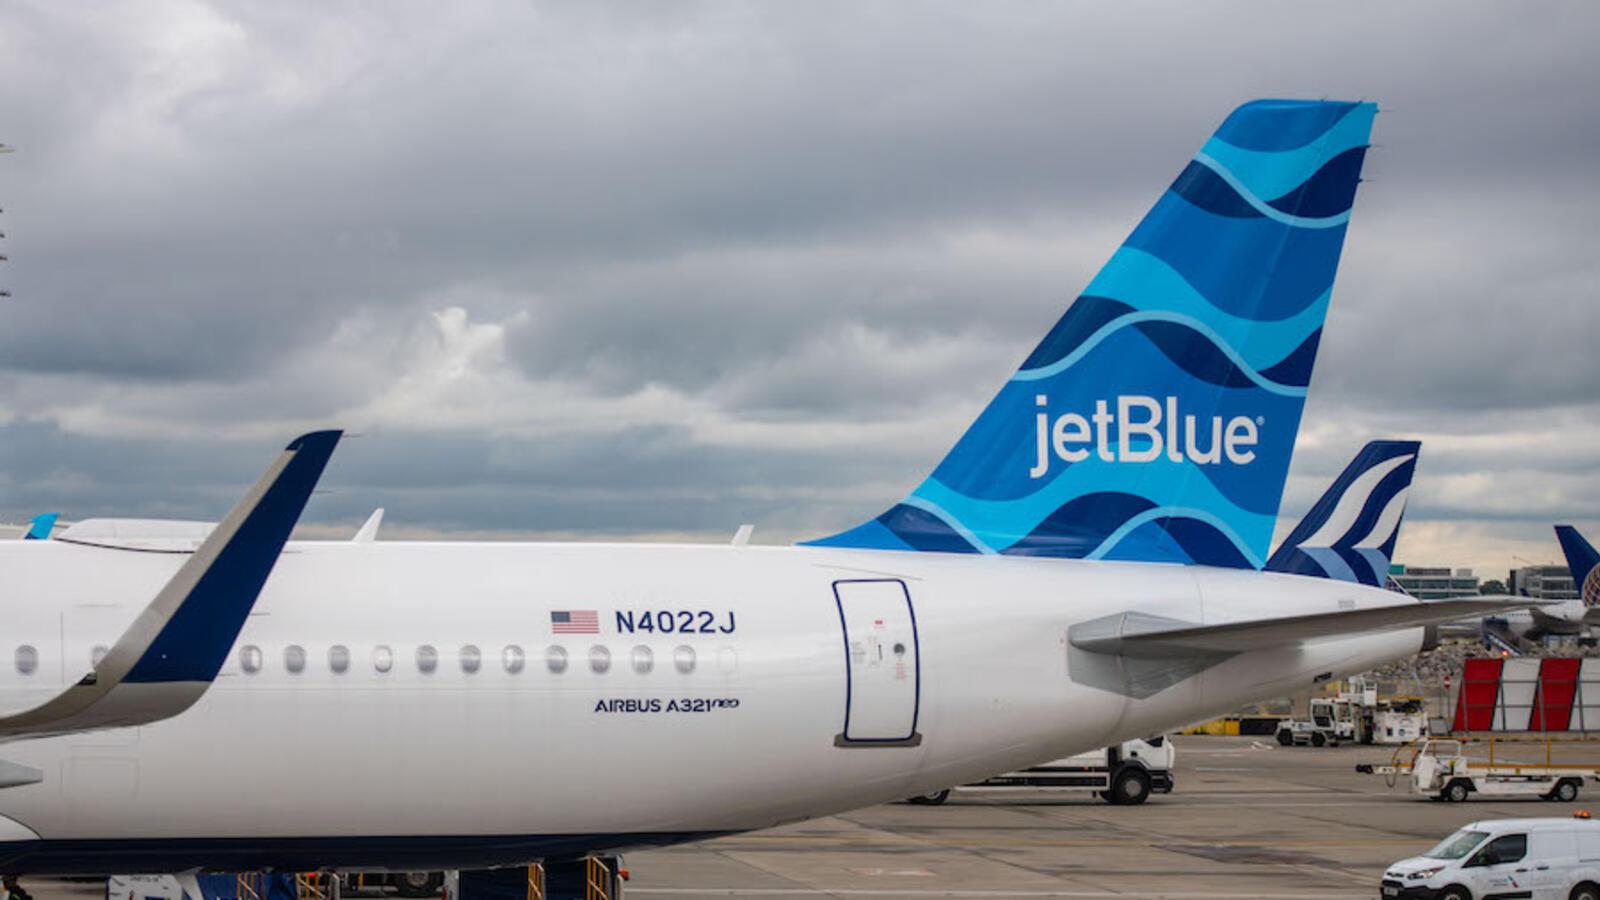 JetBlue Passenger Chokes Flight Attendant With Tie, Asks To Be Shot